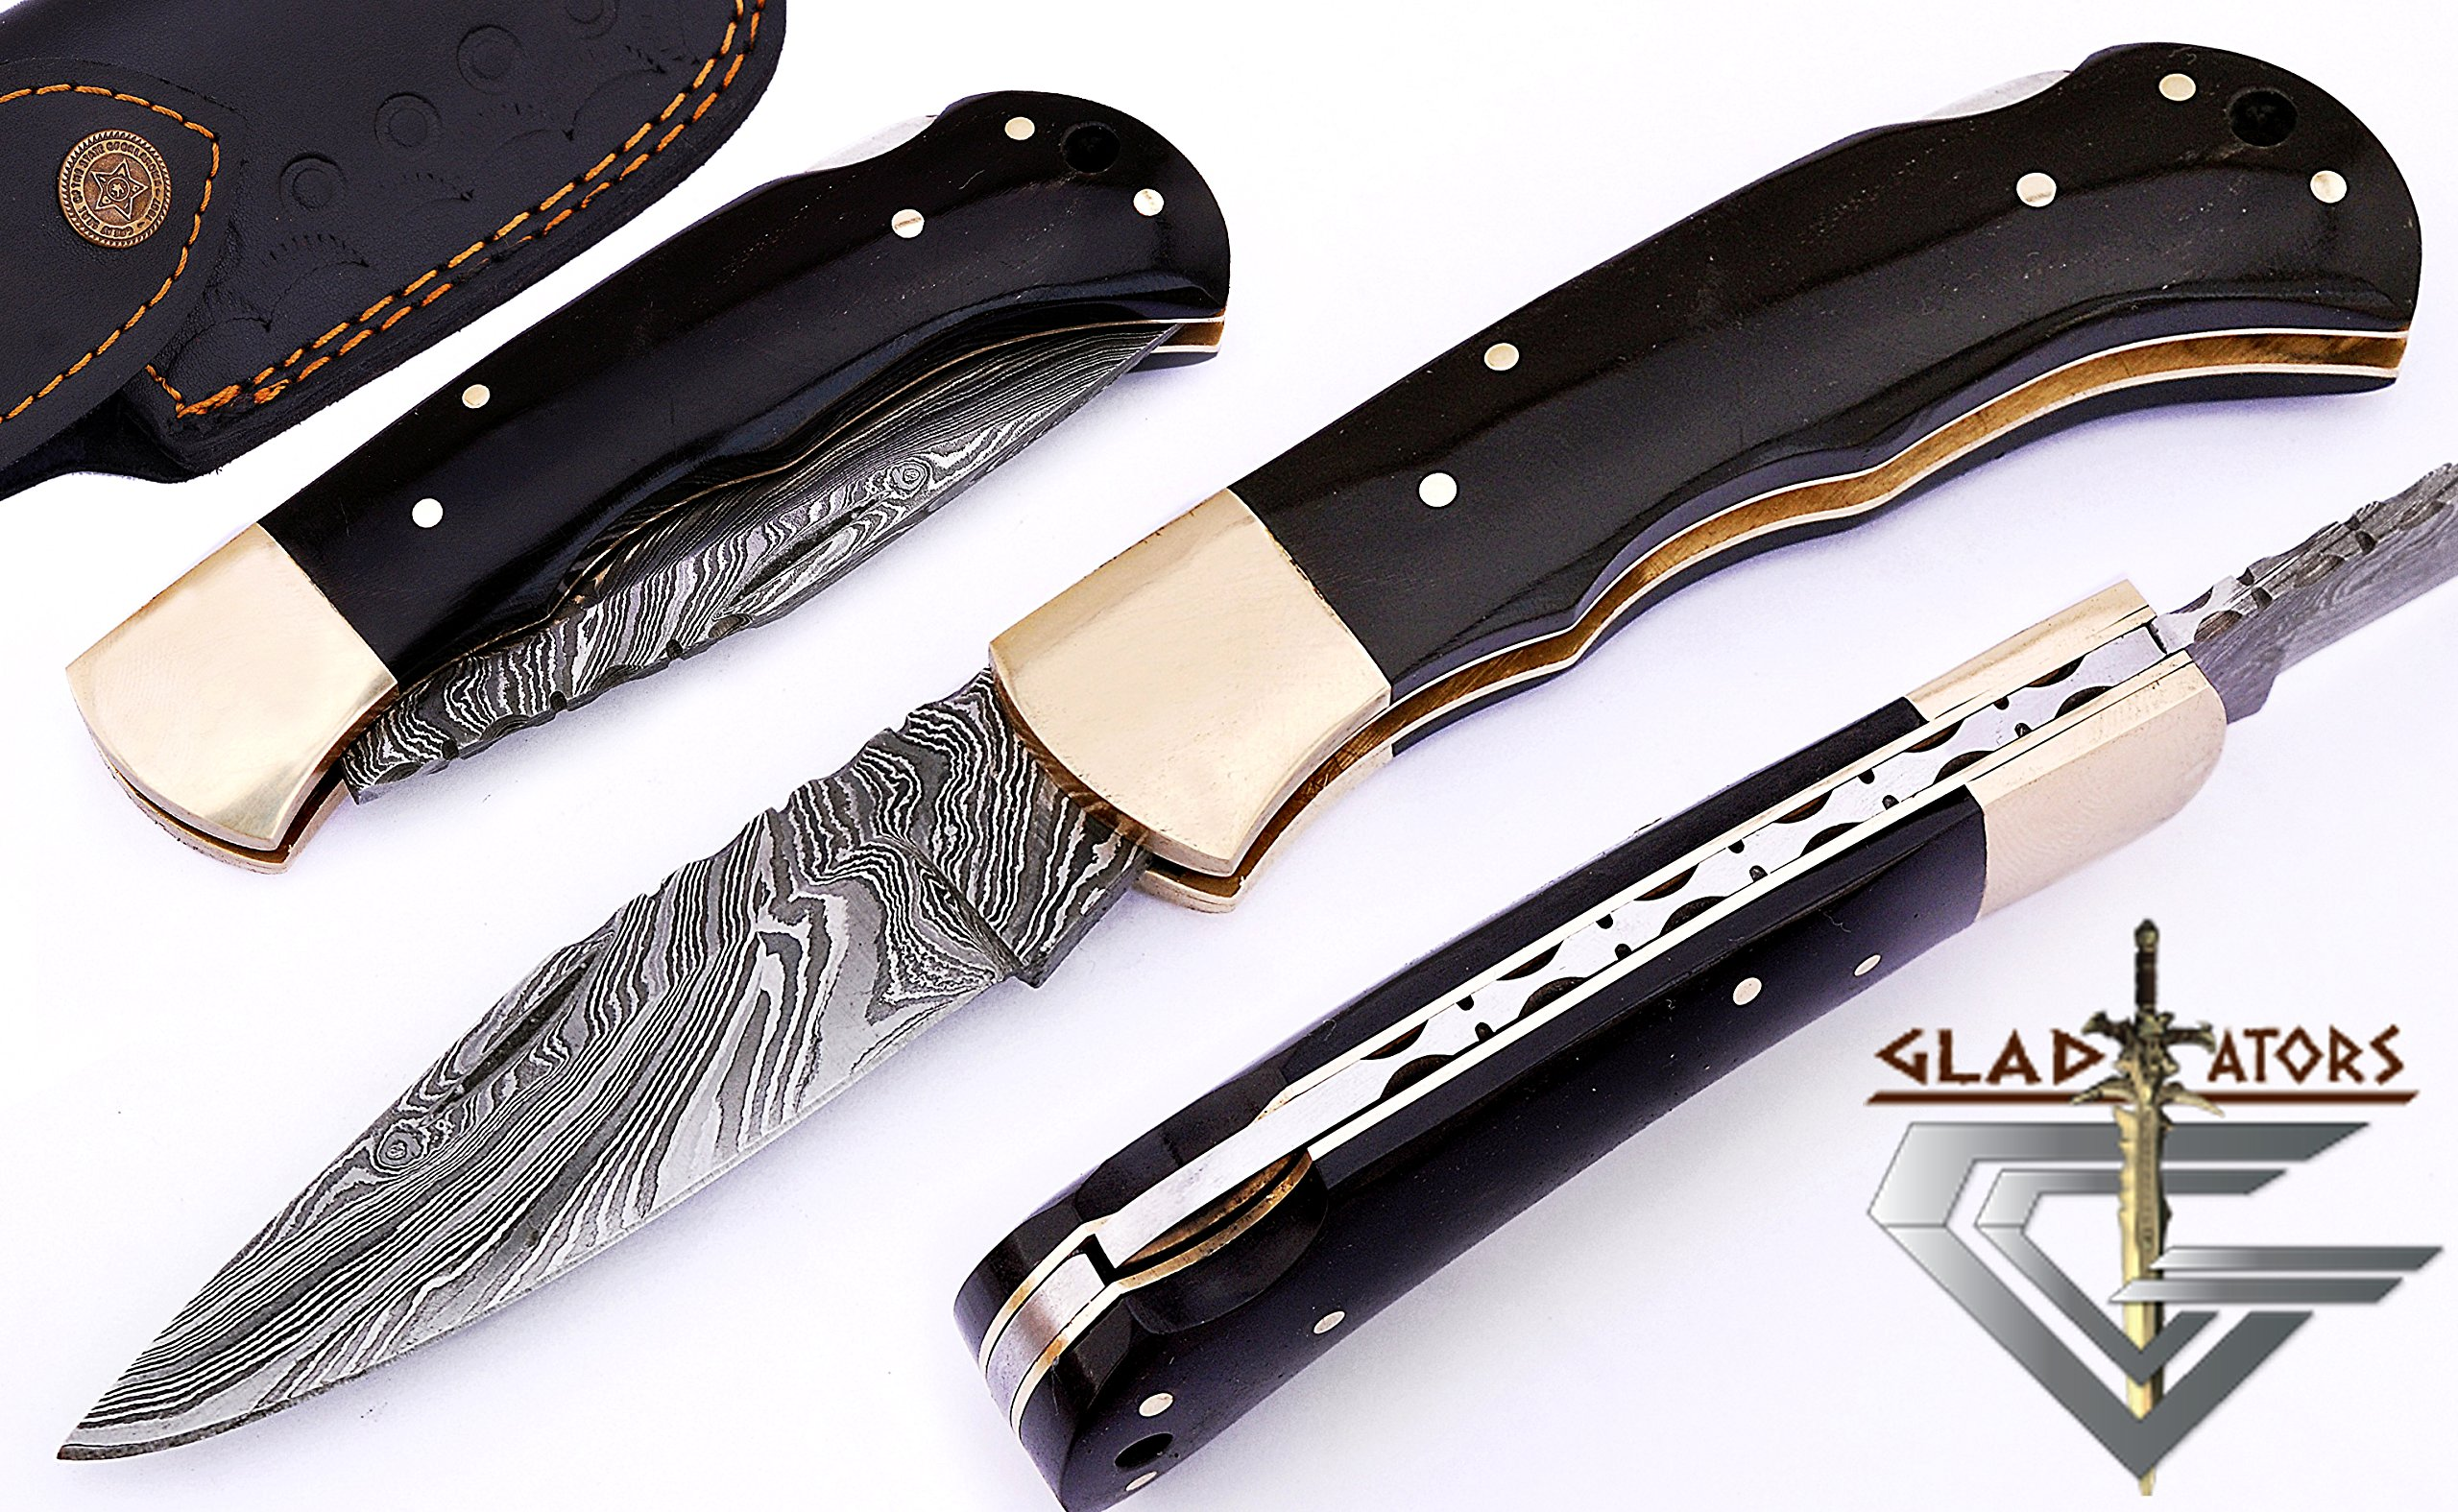 GladiatorsGuild 6011H Damascus Steel Best Folding Pocket Knife Cool Camping Hunting Knives Unique Damascus Blade Pattern (Black Horn)